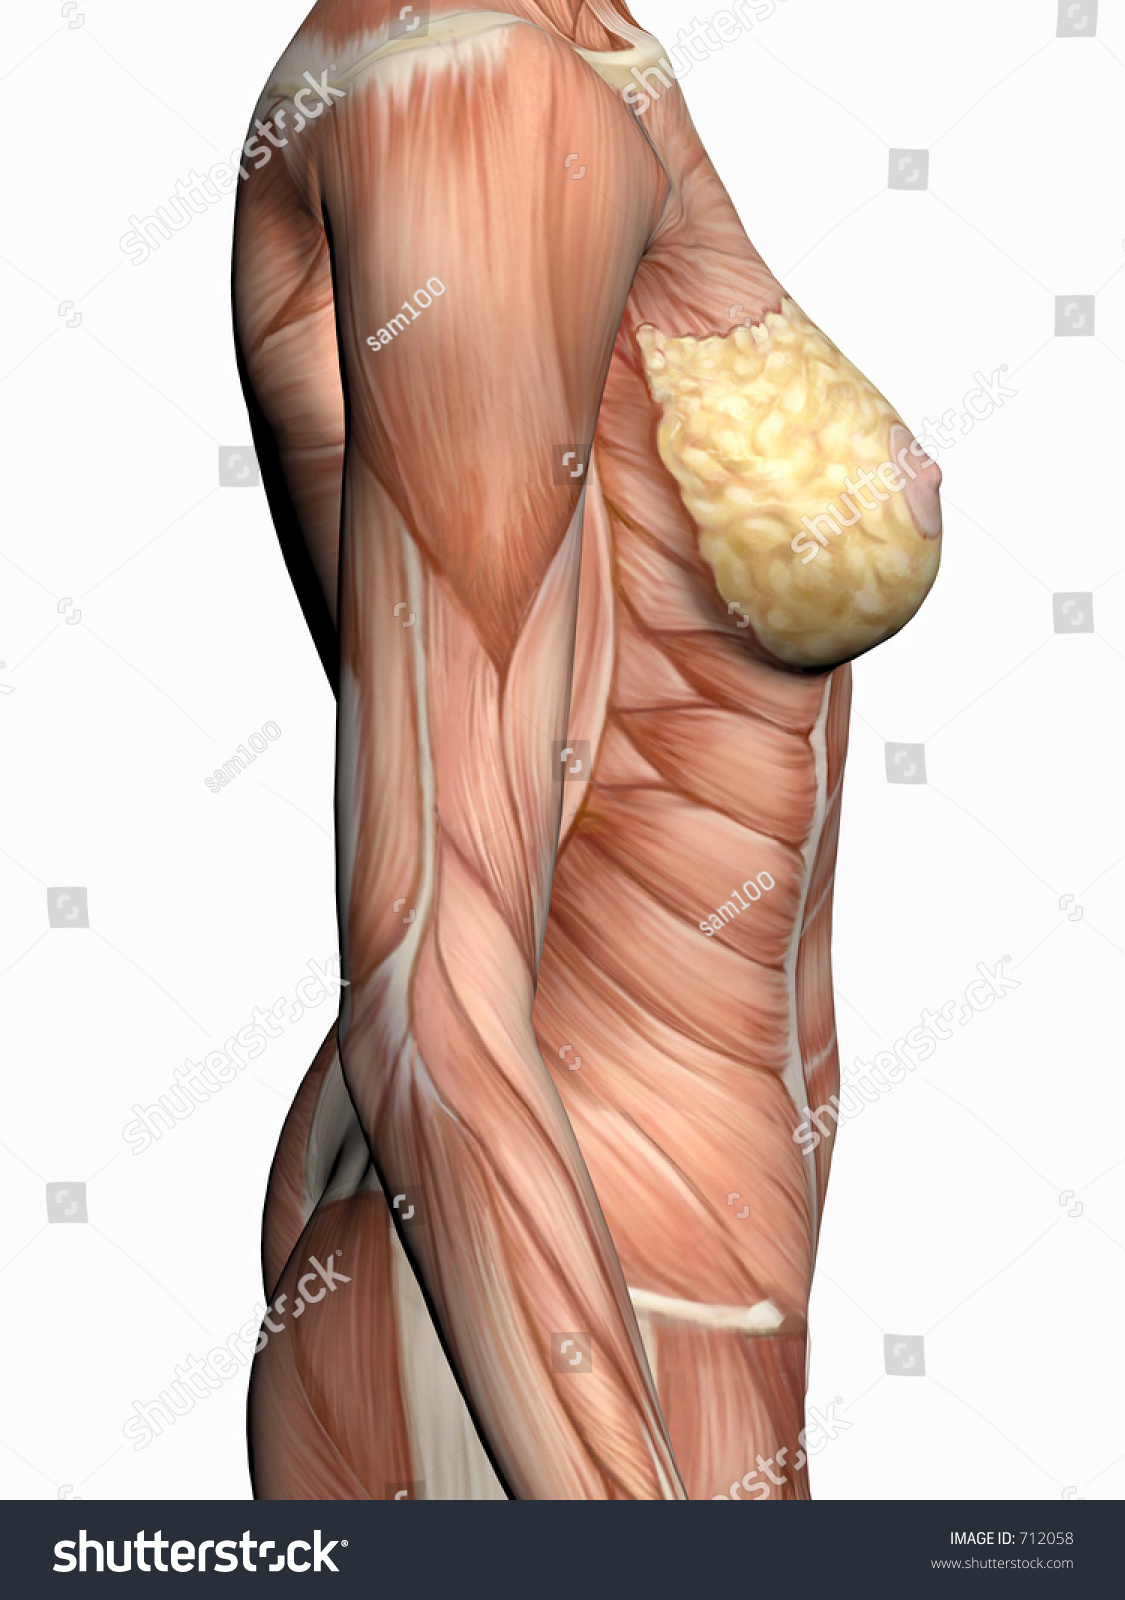 Anatomically Correct Medical Model Human Body Stock Illustration